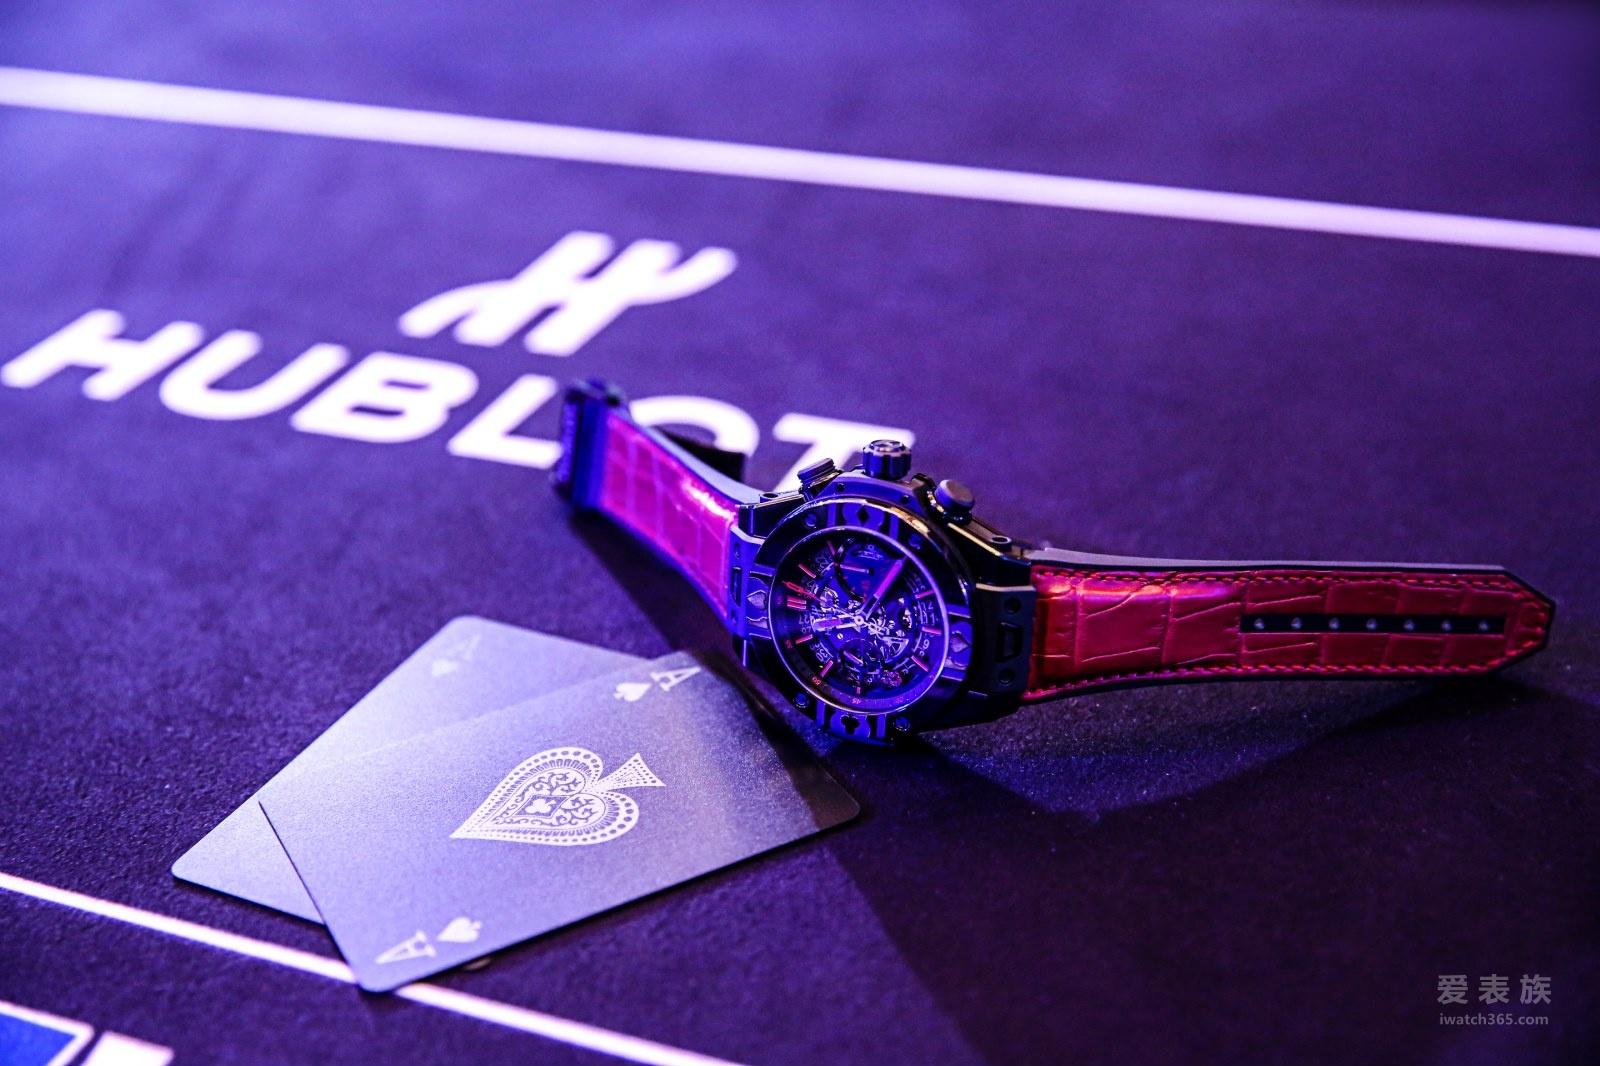 HUBLOT宇舶表Big Bang Unico 世界扑克巡回赛限量腕表